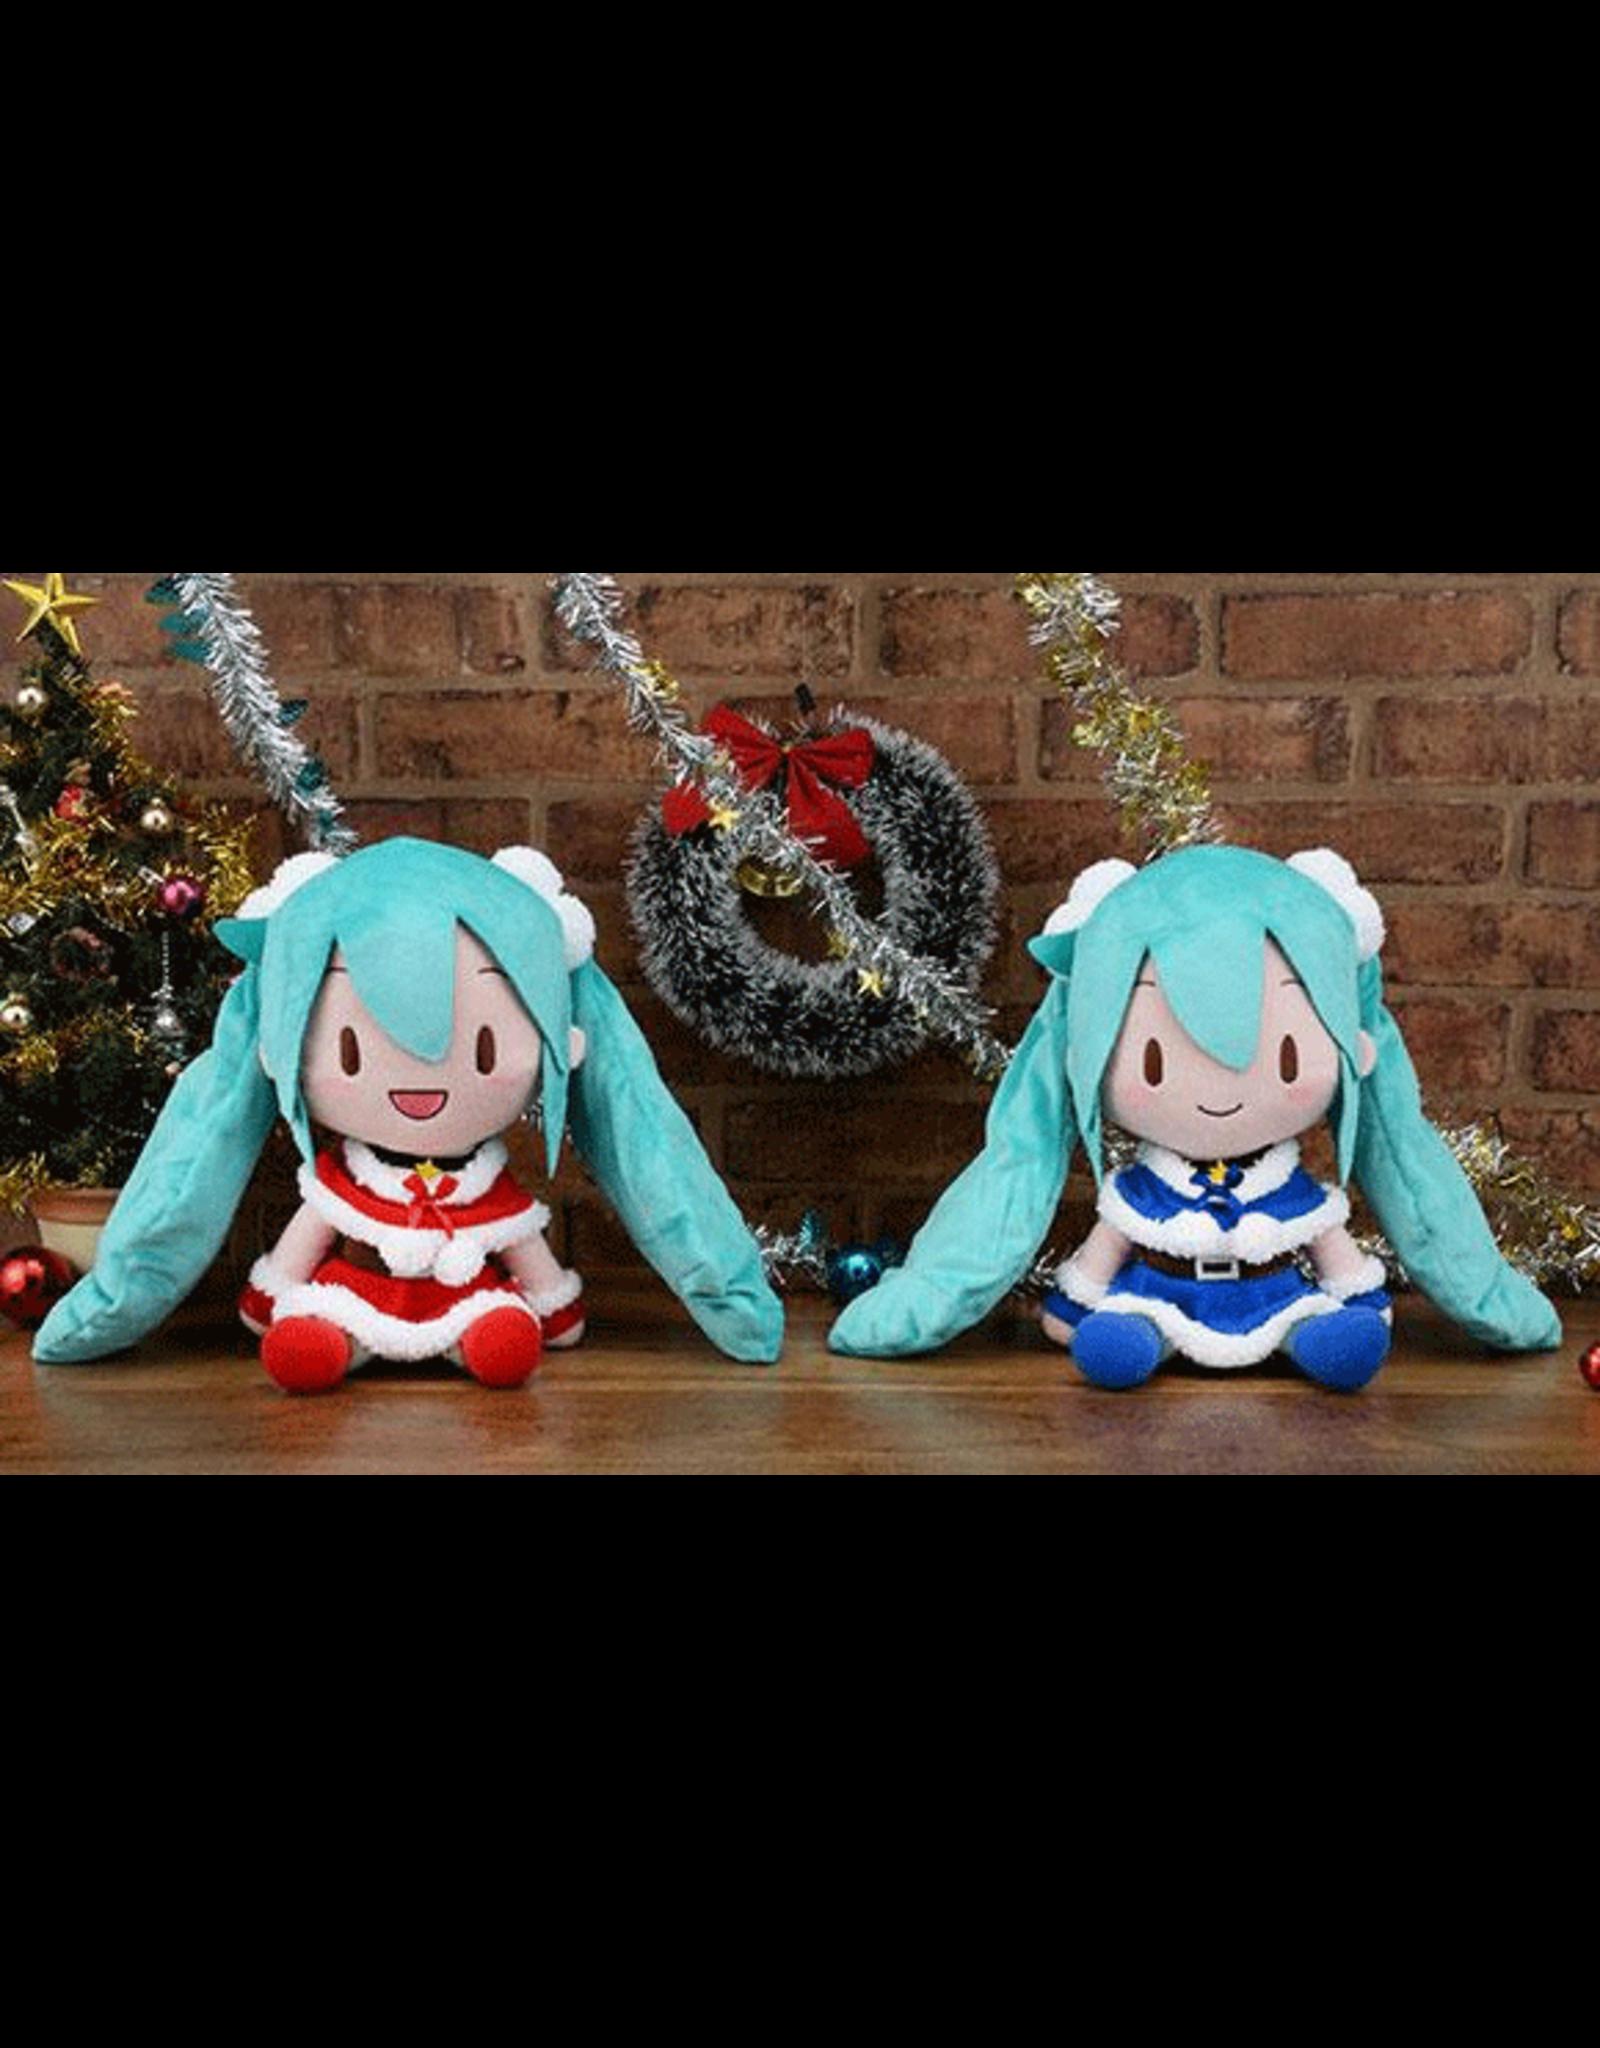 Hatsune Miku Christmas Plush - 30cm - Blue